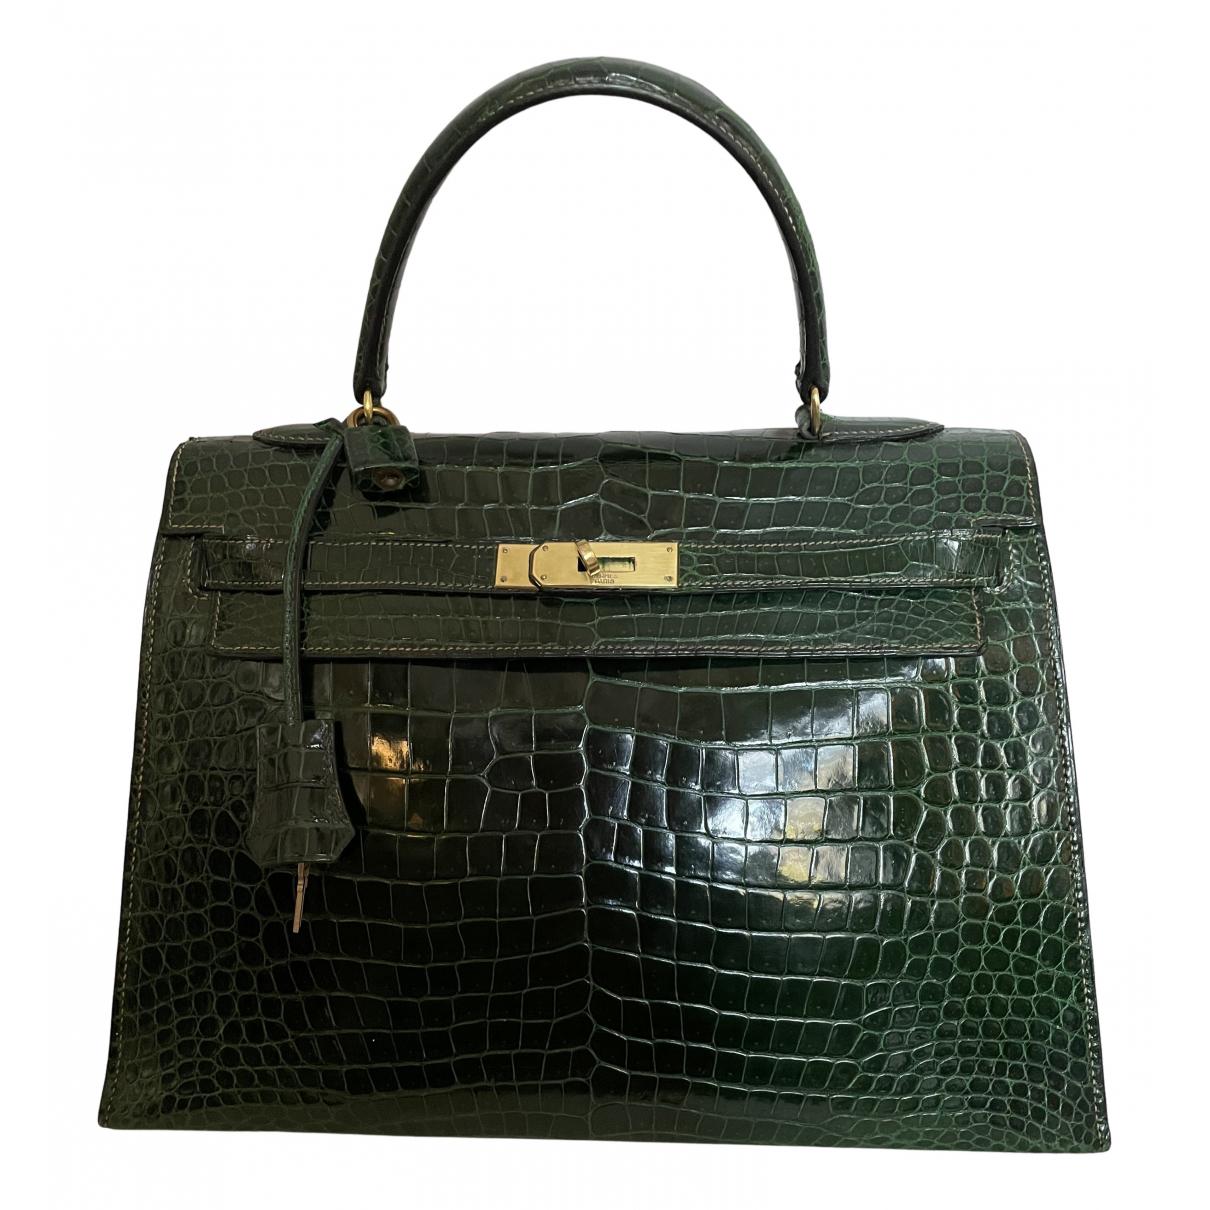 Hermes - Sac a main Kelly 32 pour femme en crocodile - vert